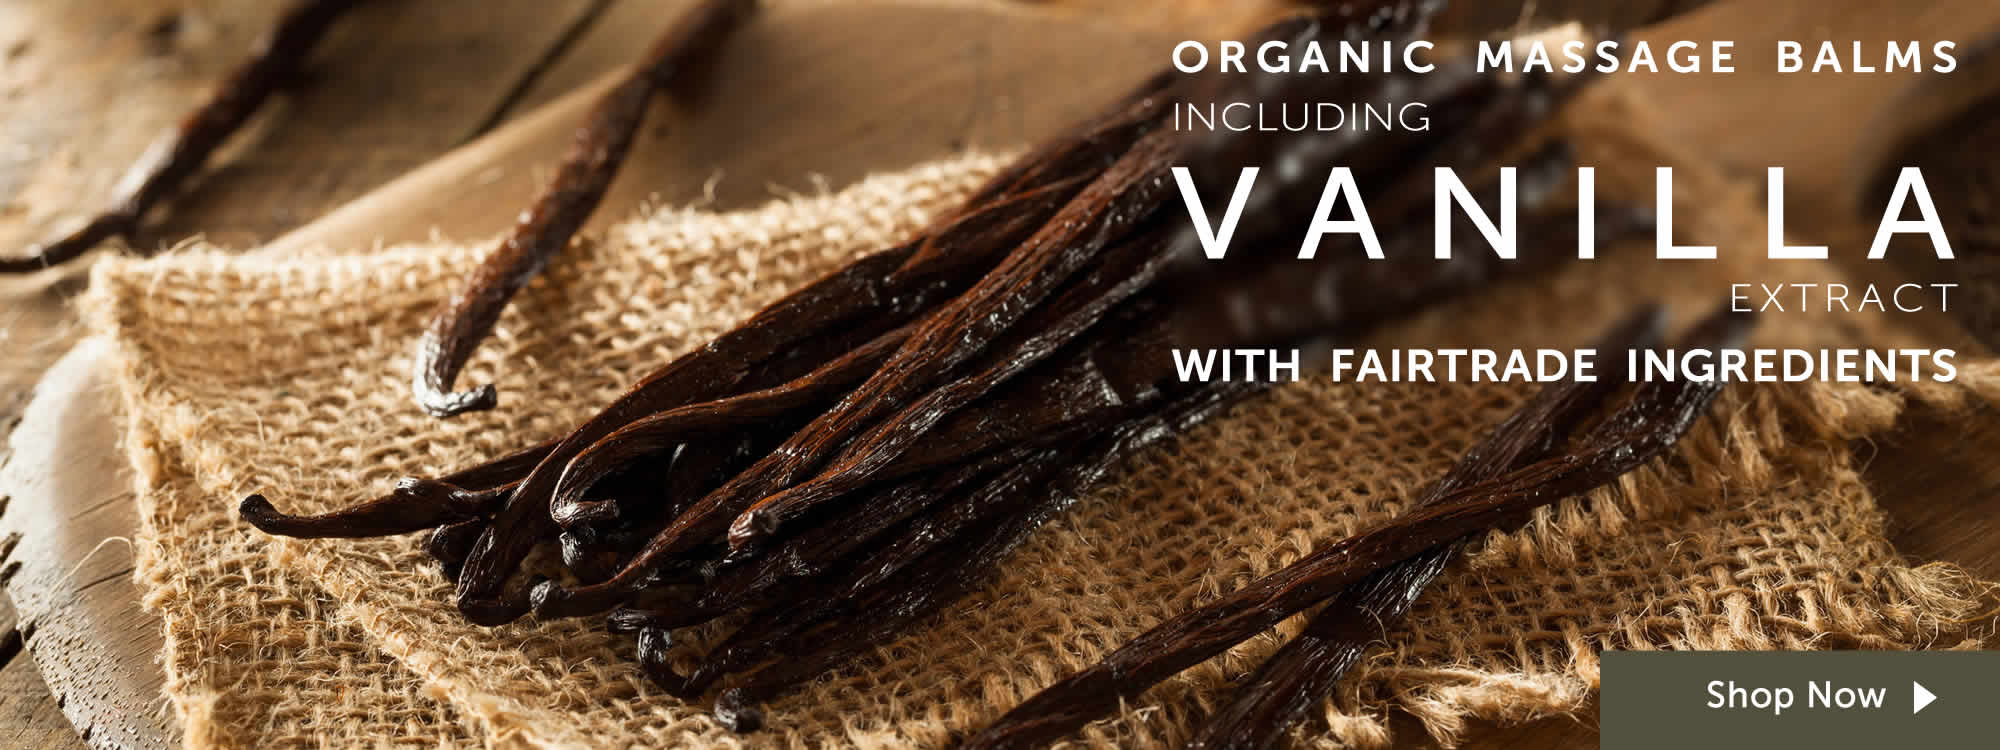 Mumanu Organic Massage Oil & Body Balm With Vanilla - Shea Moisturiser & Ethcial Skin Care - With Fairtrade Ingredients